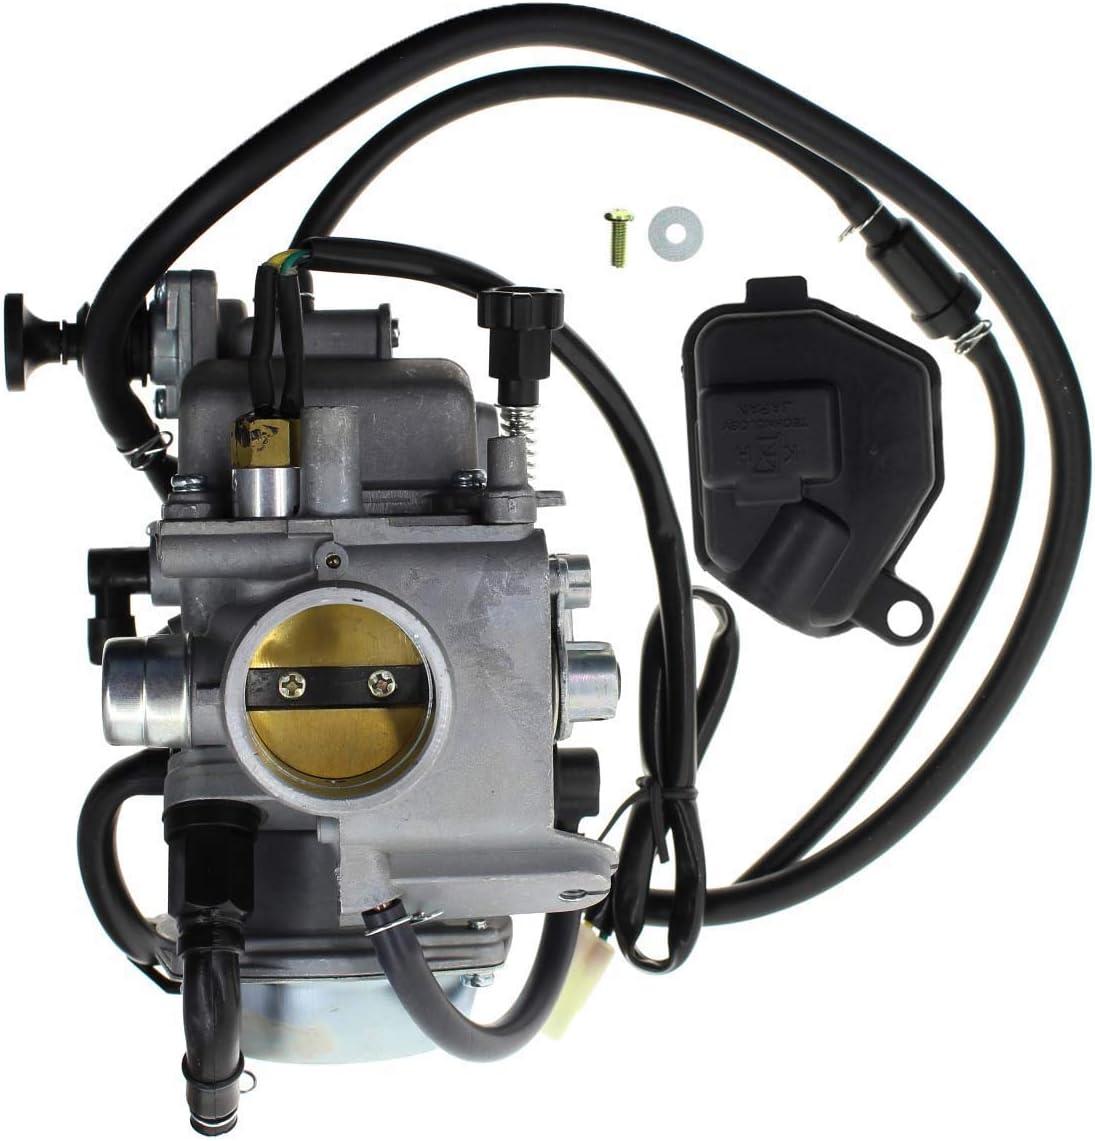 Carbhub Carburetor for 2000-2006 Honda Rancher 350 TRX350 Carburetor 2000 2001 2002 2003 2004 2005 2006 Honda Rancher 350 TRX350 Carburetor Replaces 16100-HN5-M41